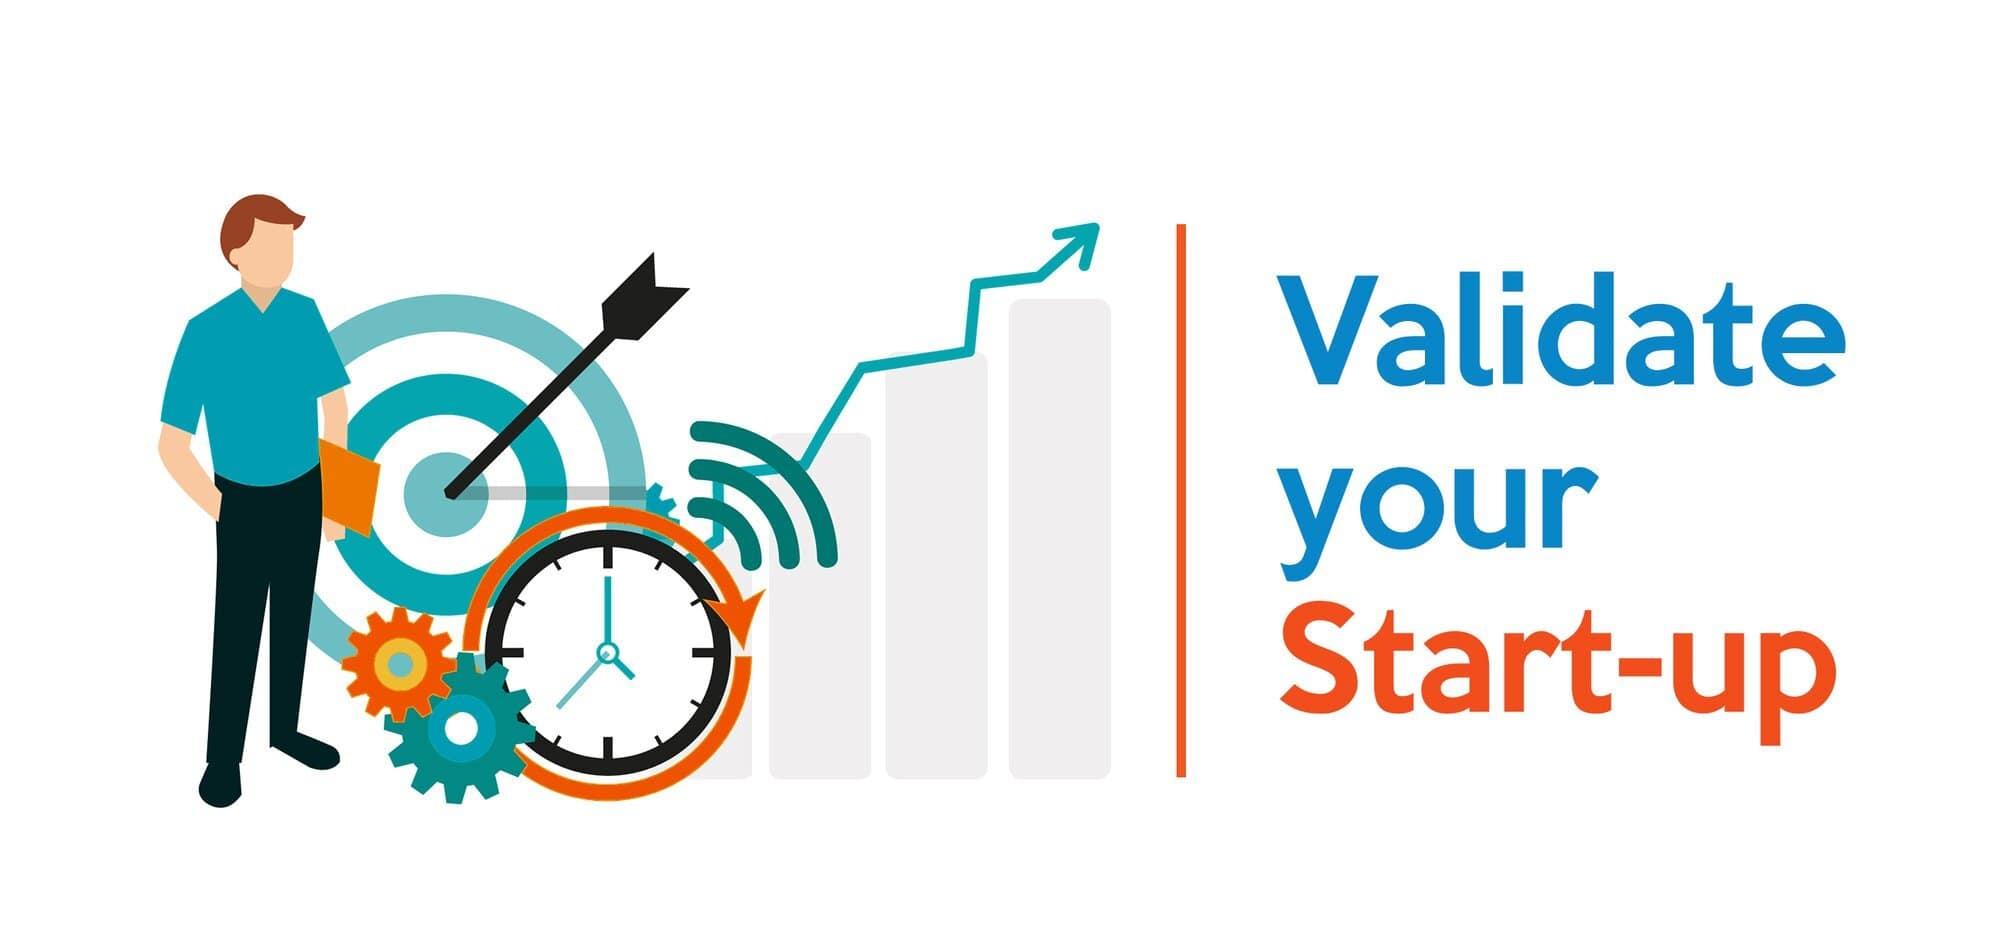 MVP: Quickly Validate your Start-Up | Raidan.com.au